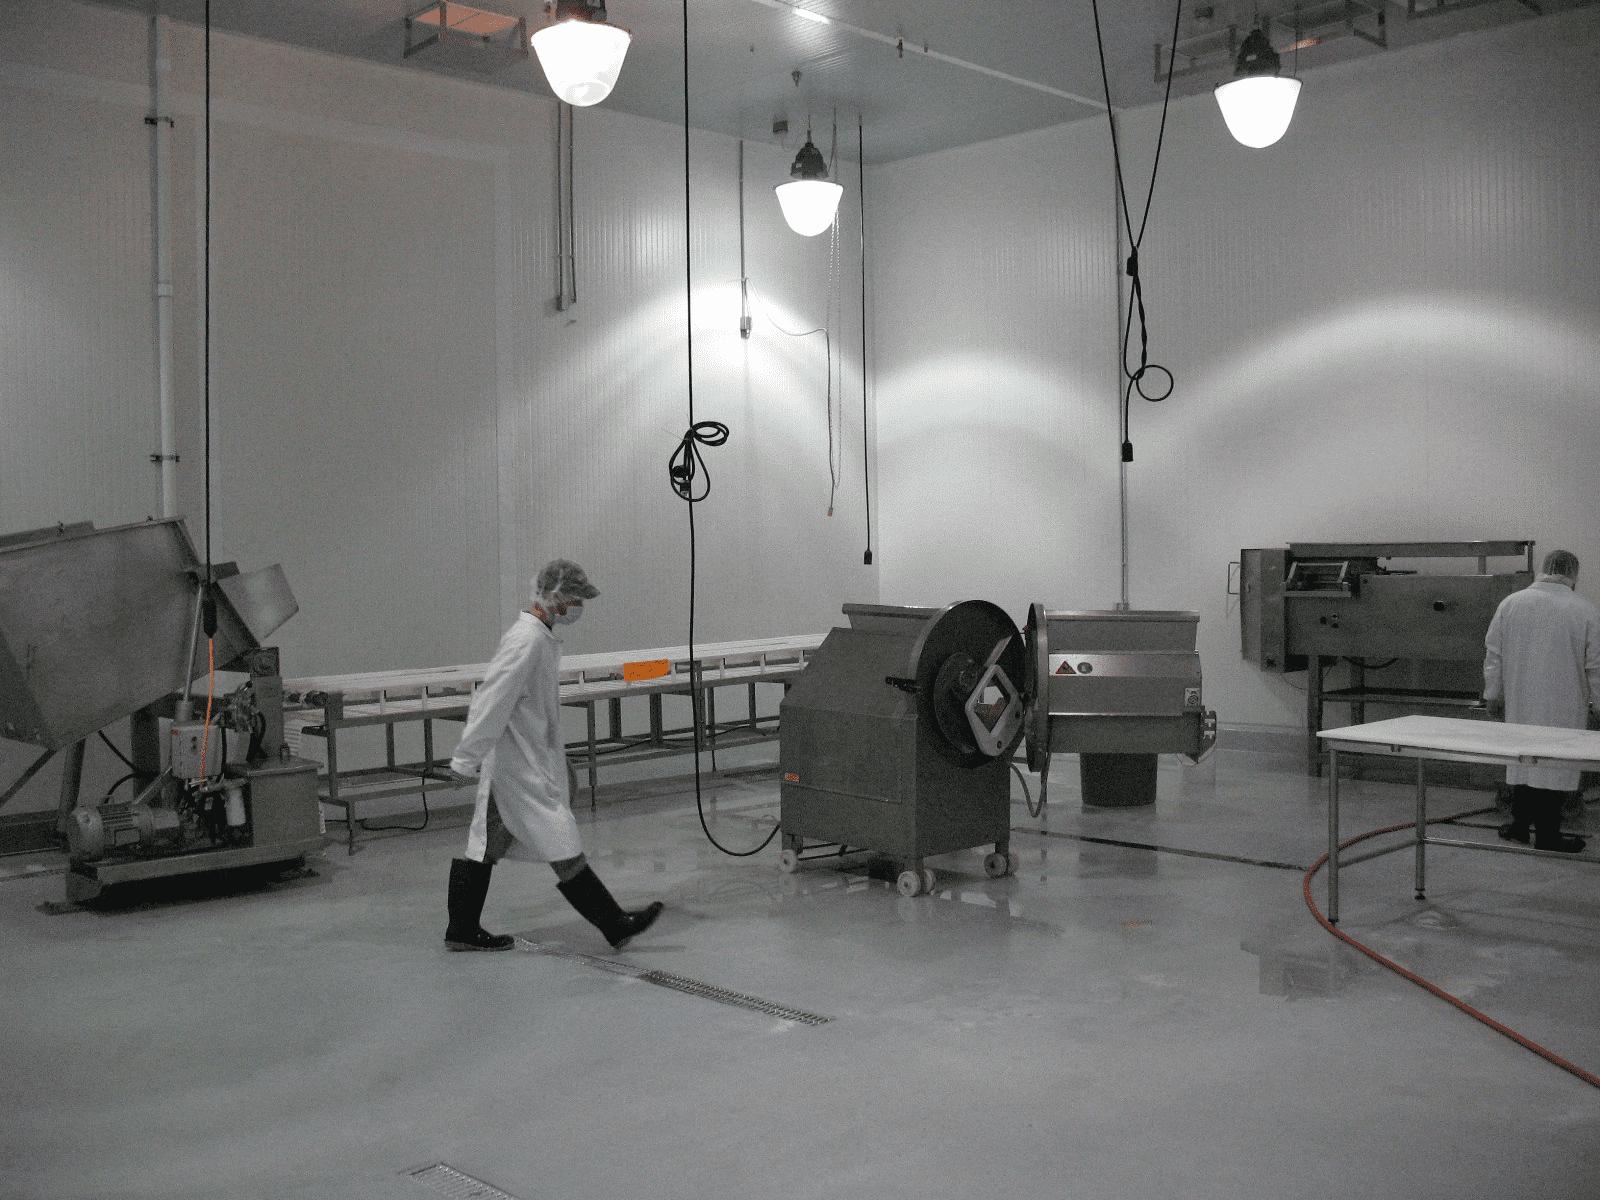 Fabrieksvloer